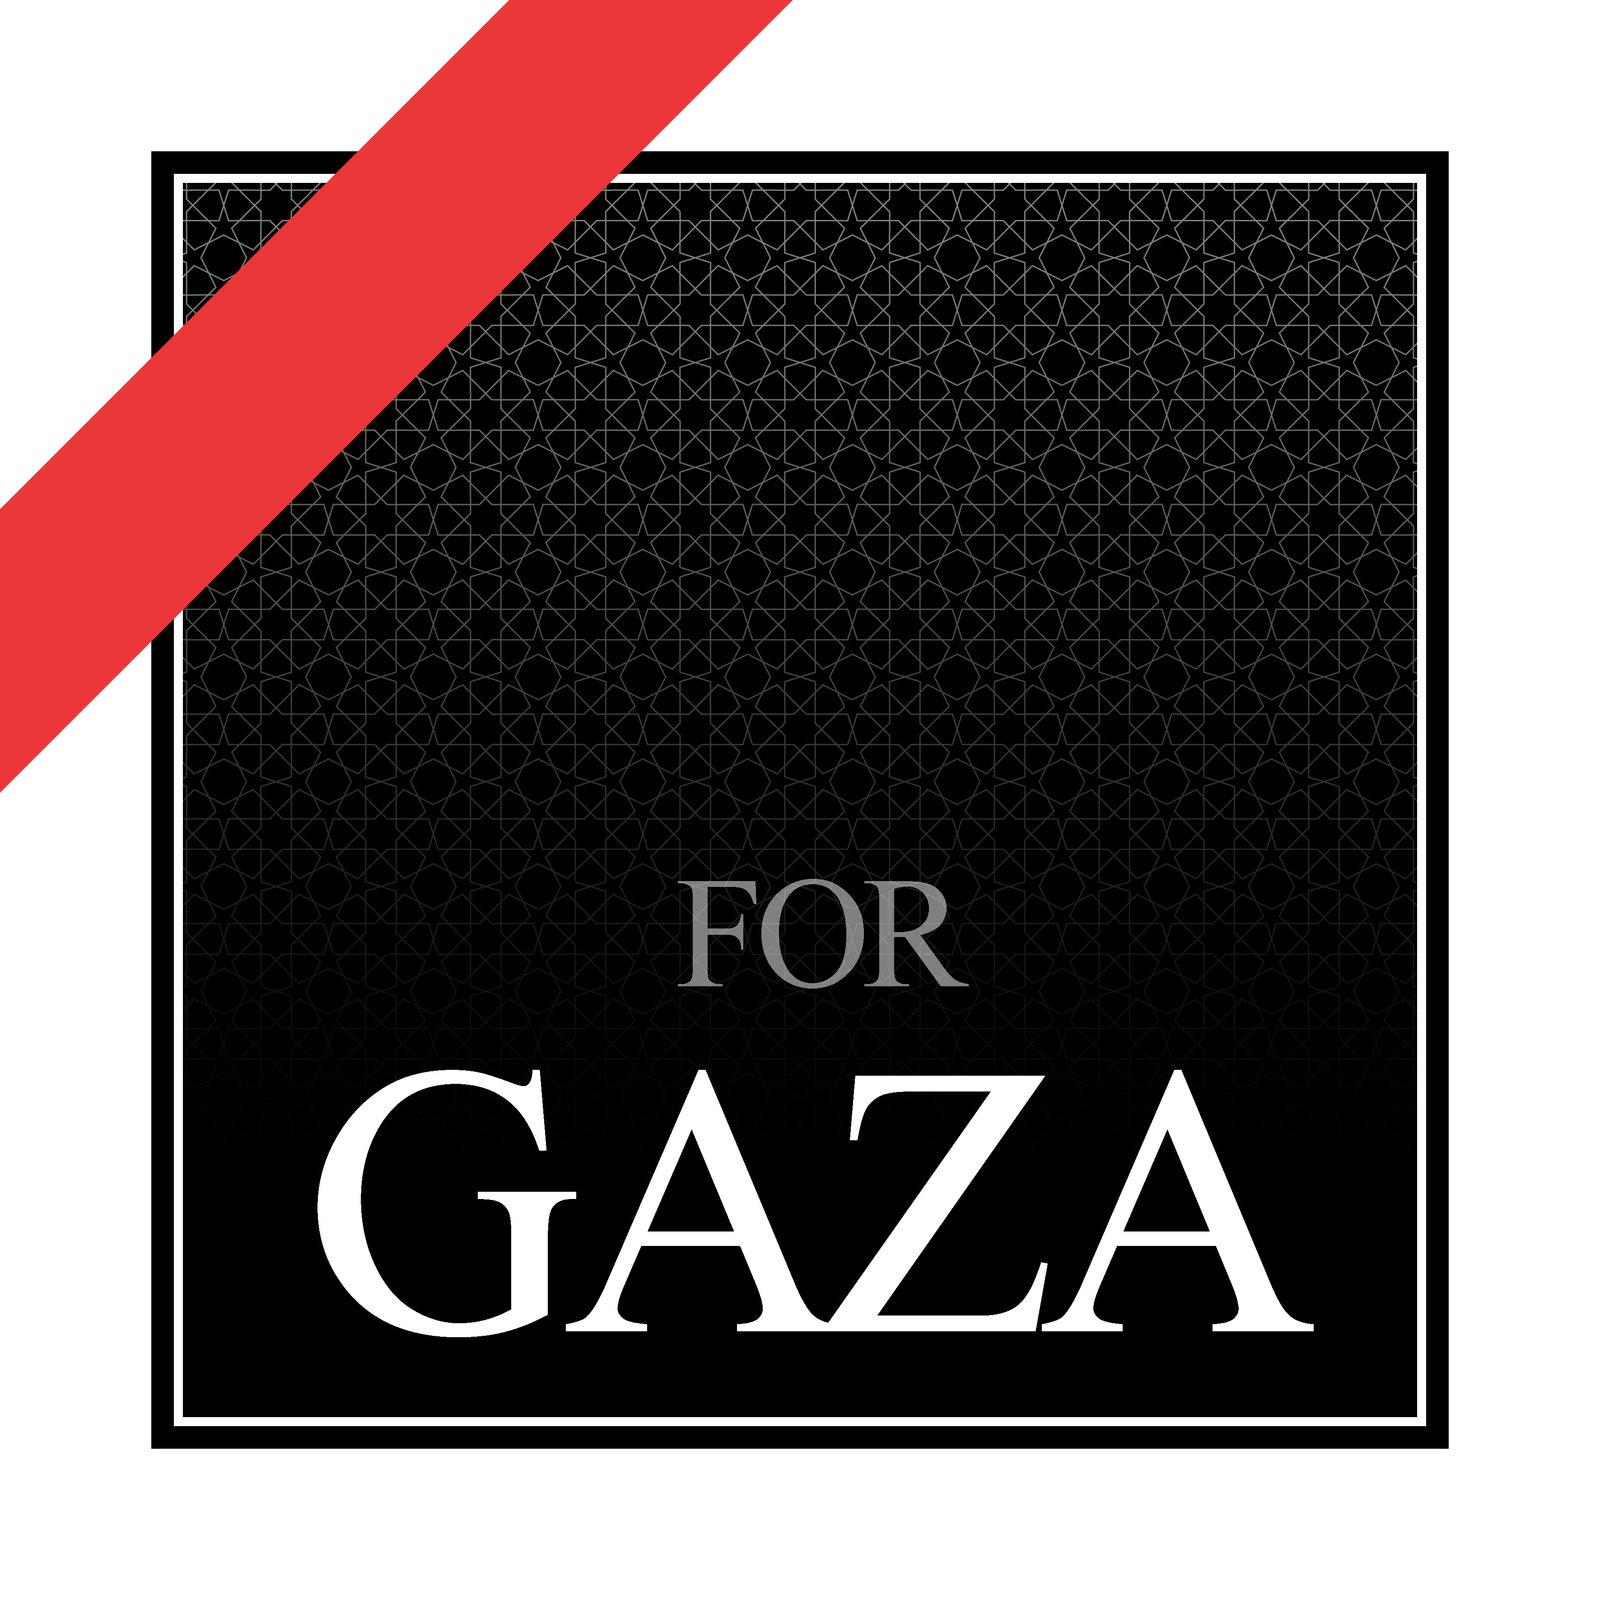 FOR GAZA by WhiTeBiRdTurk